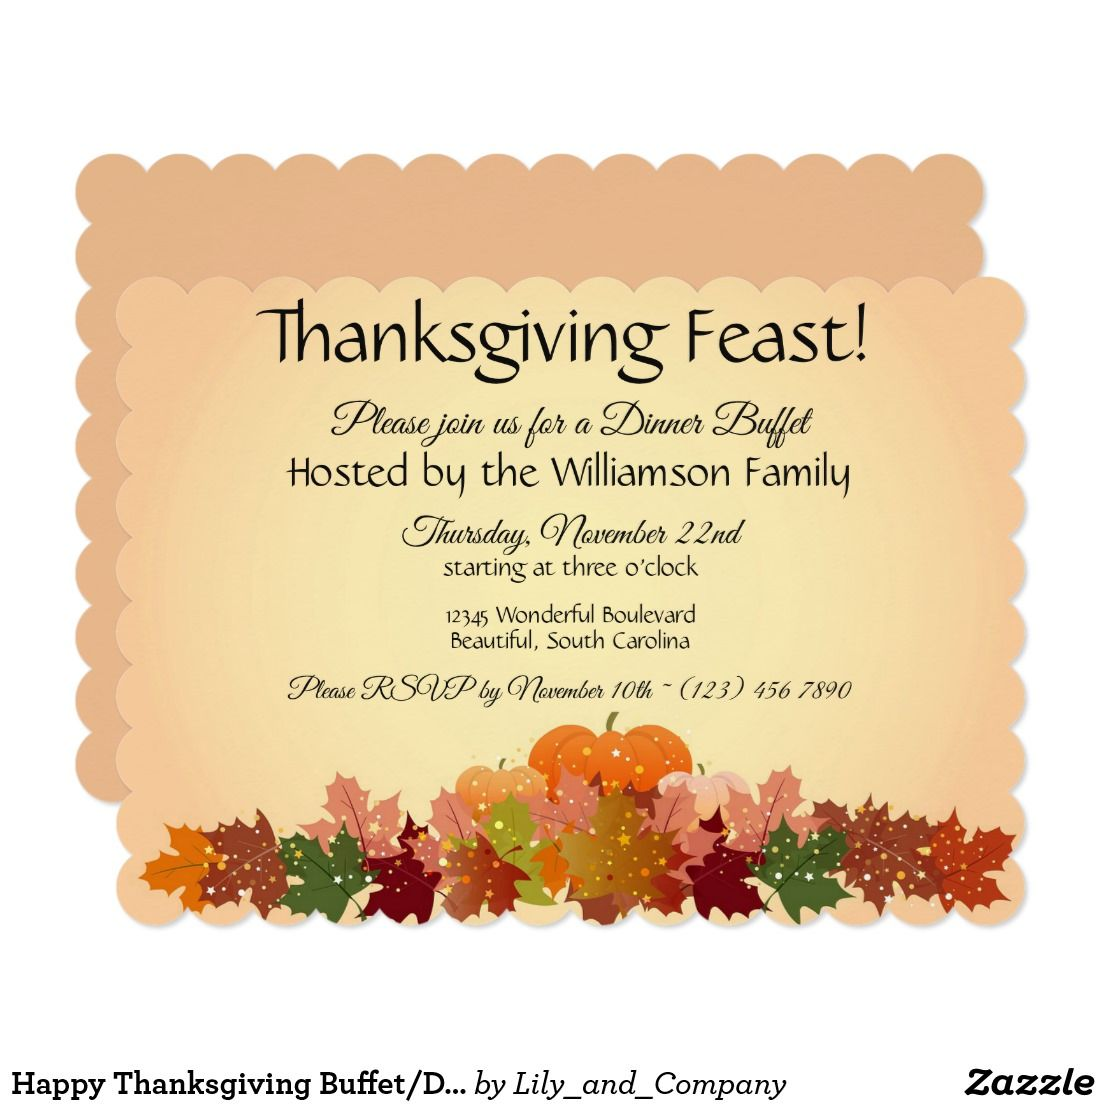 Happy Thanksgiving Buffet Dinner Feast Invitation